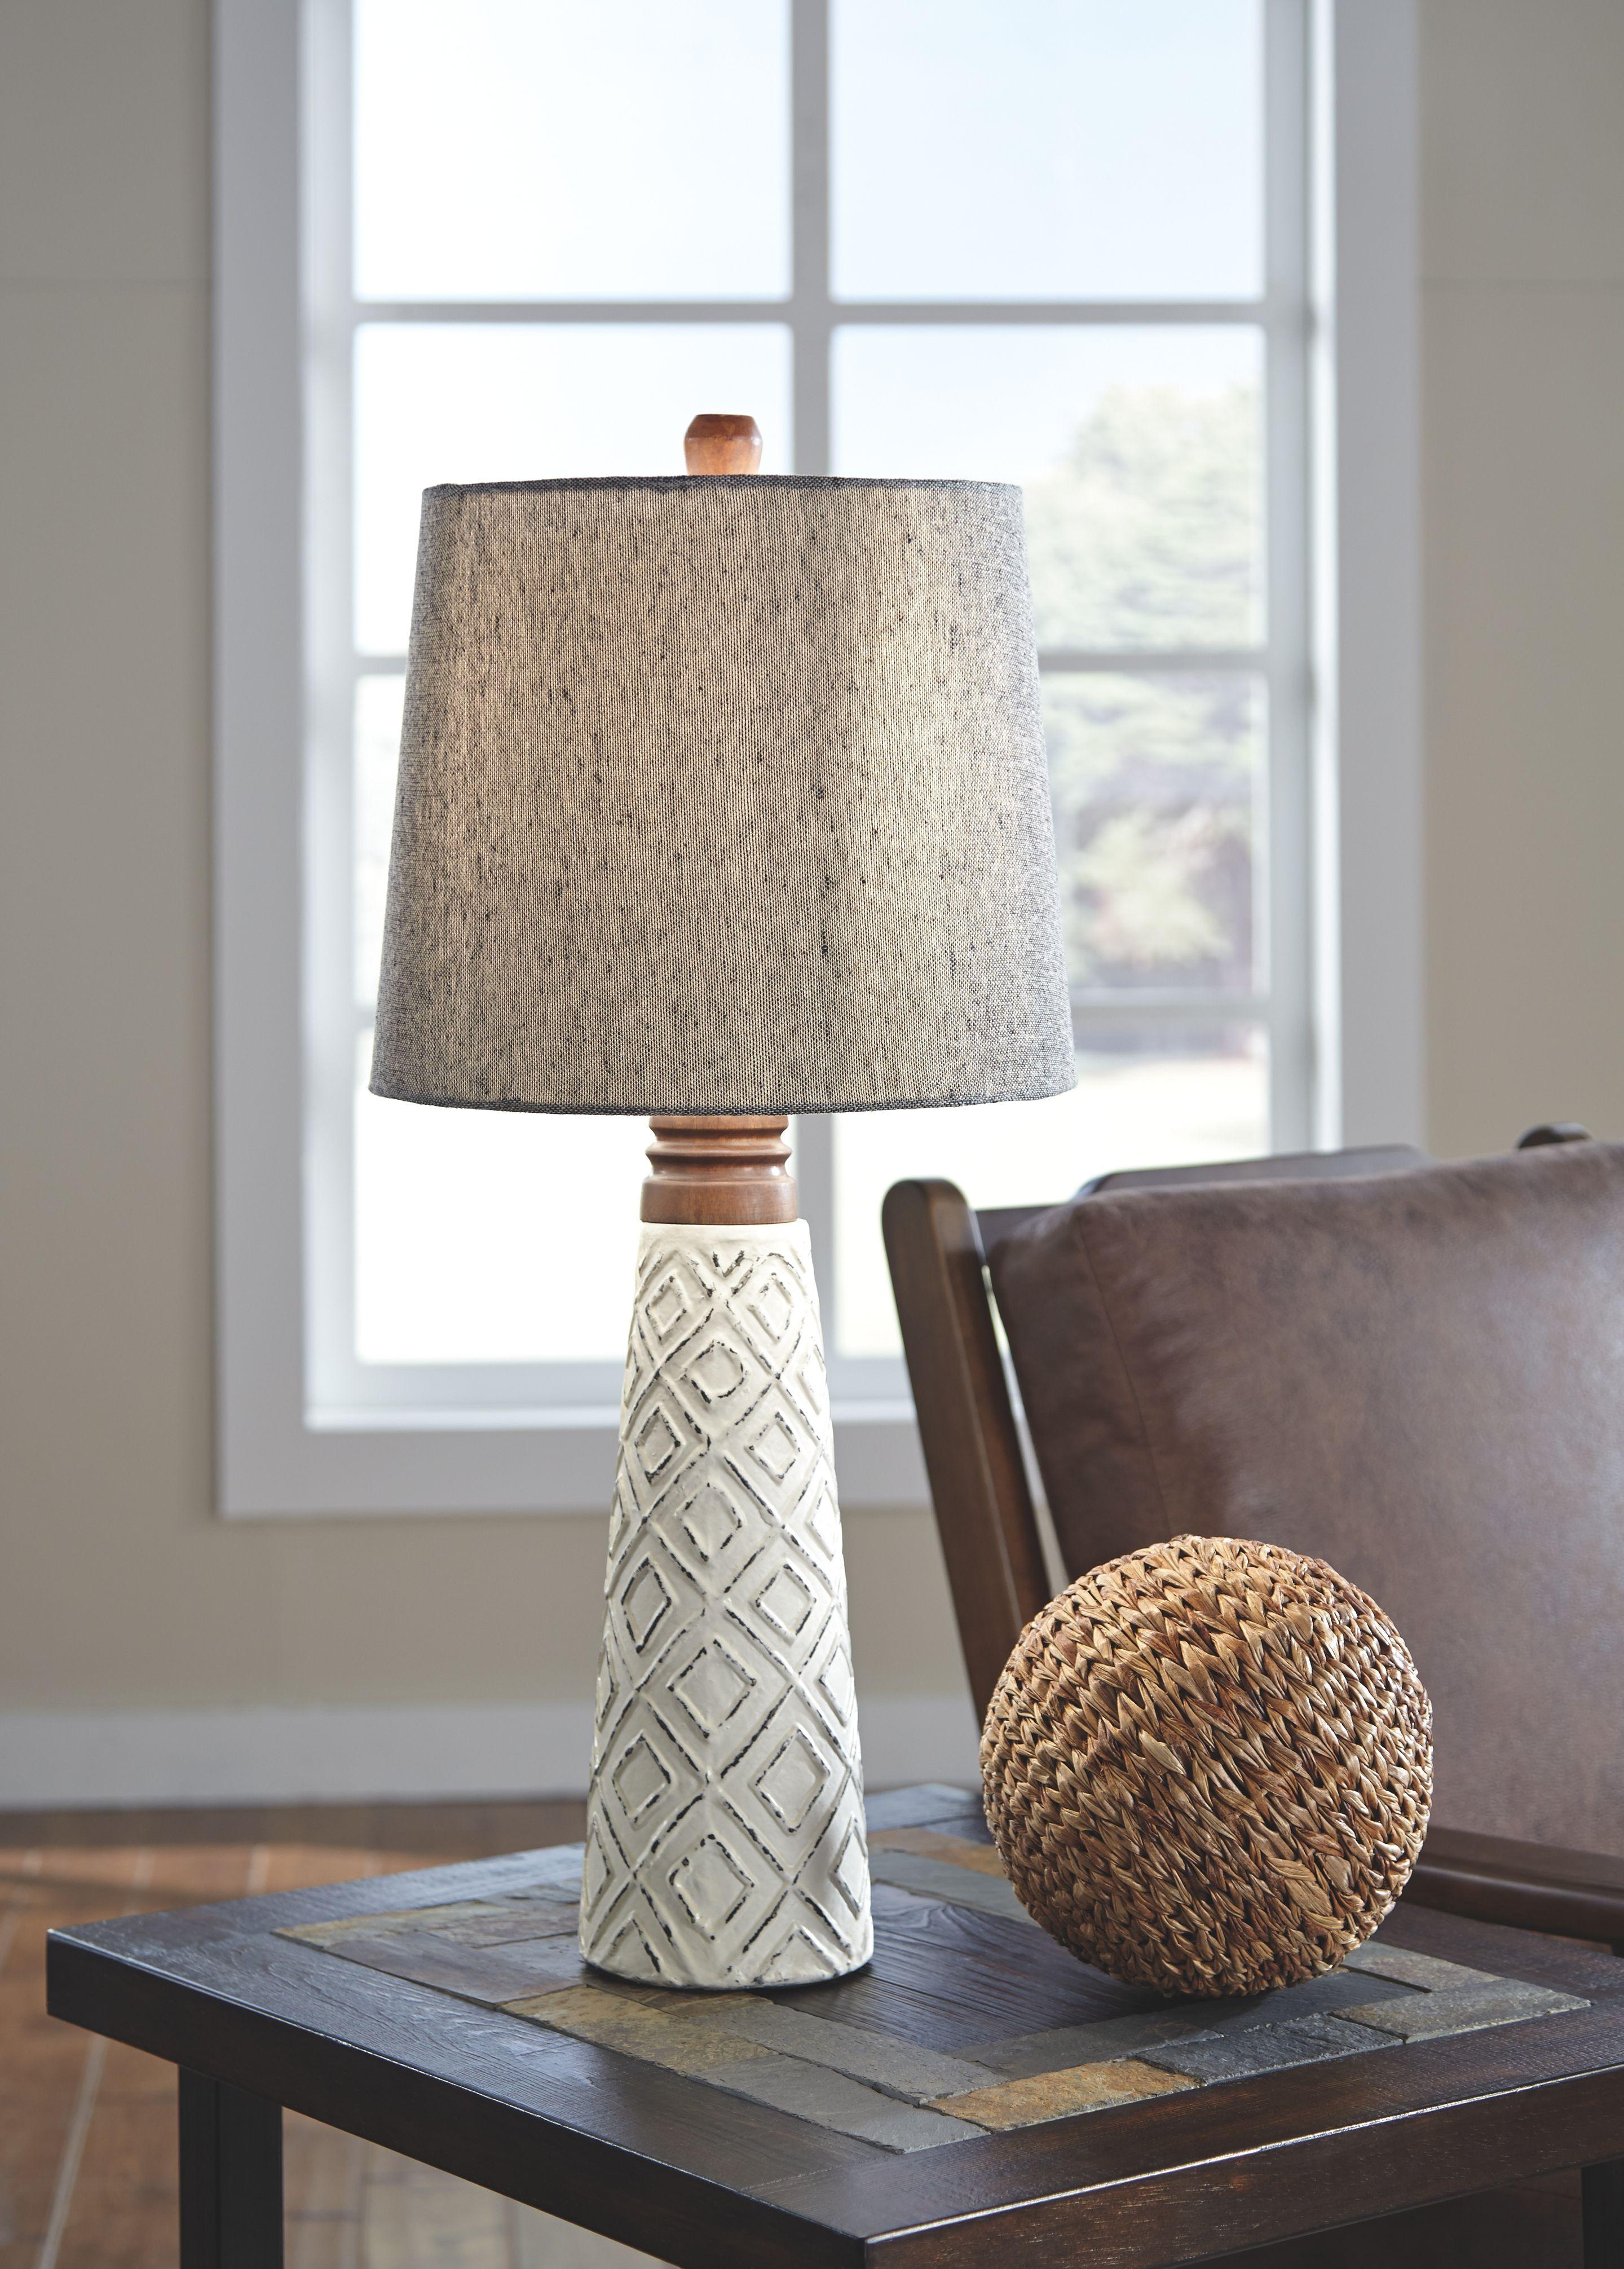 Cutris Table Lamp Set Of 2 White Black In 2020 Black Table Lamps Table Lamps For Bedroom Table Lamp